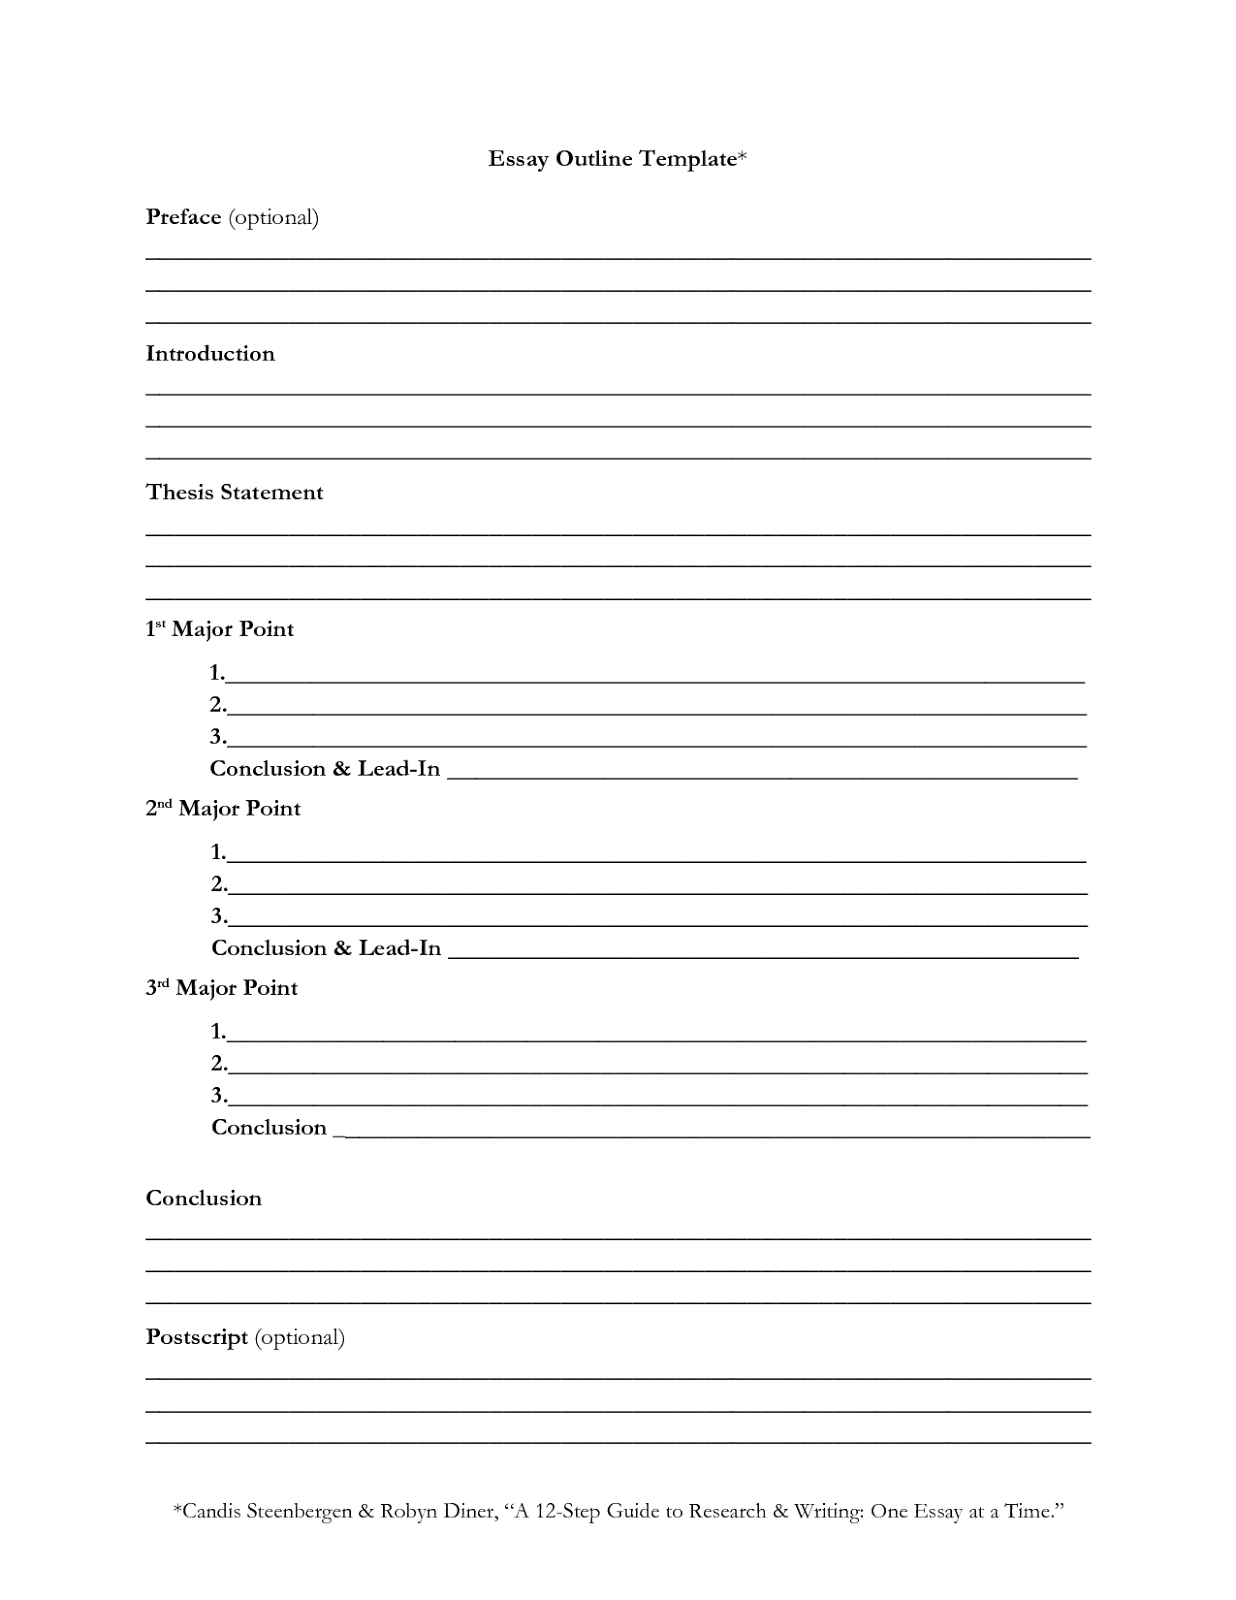 (1236×1600) Essay outline template